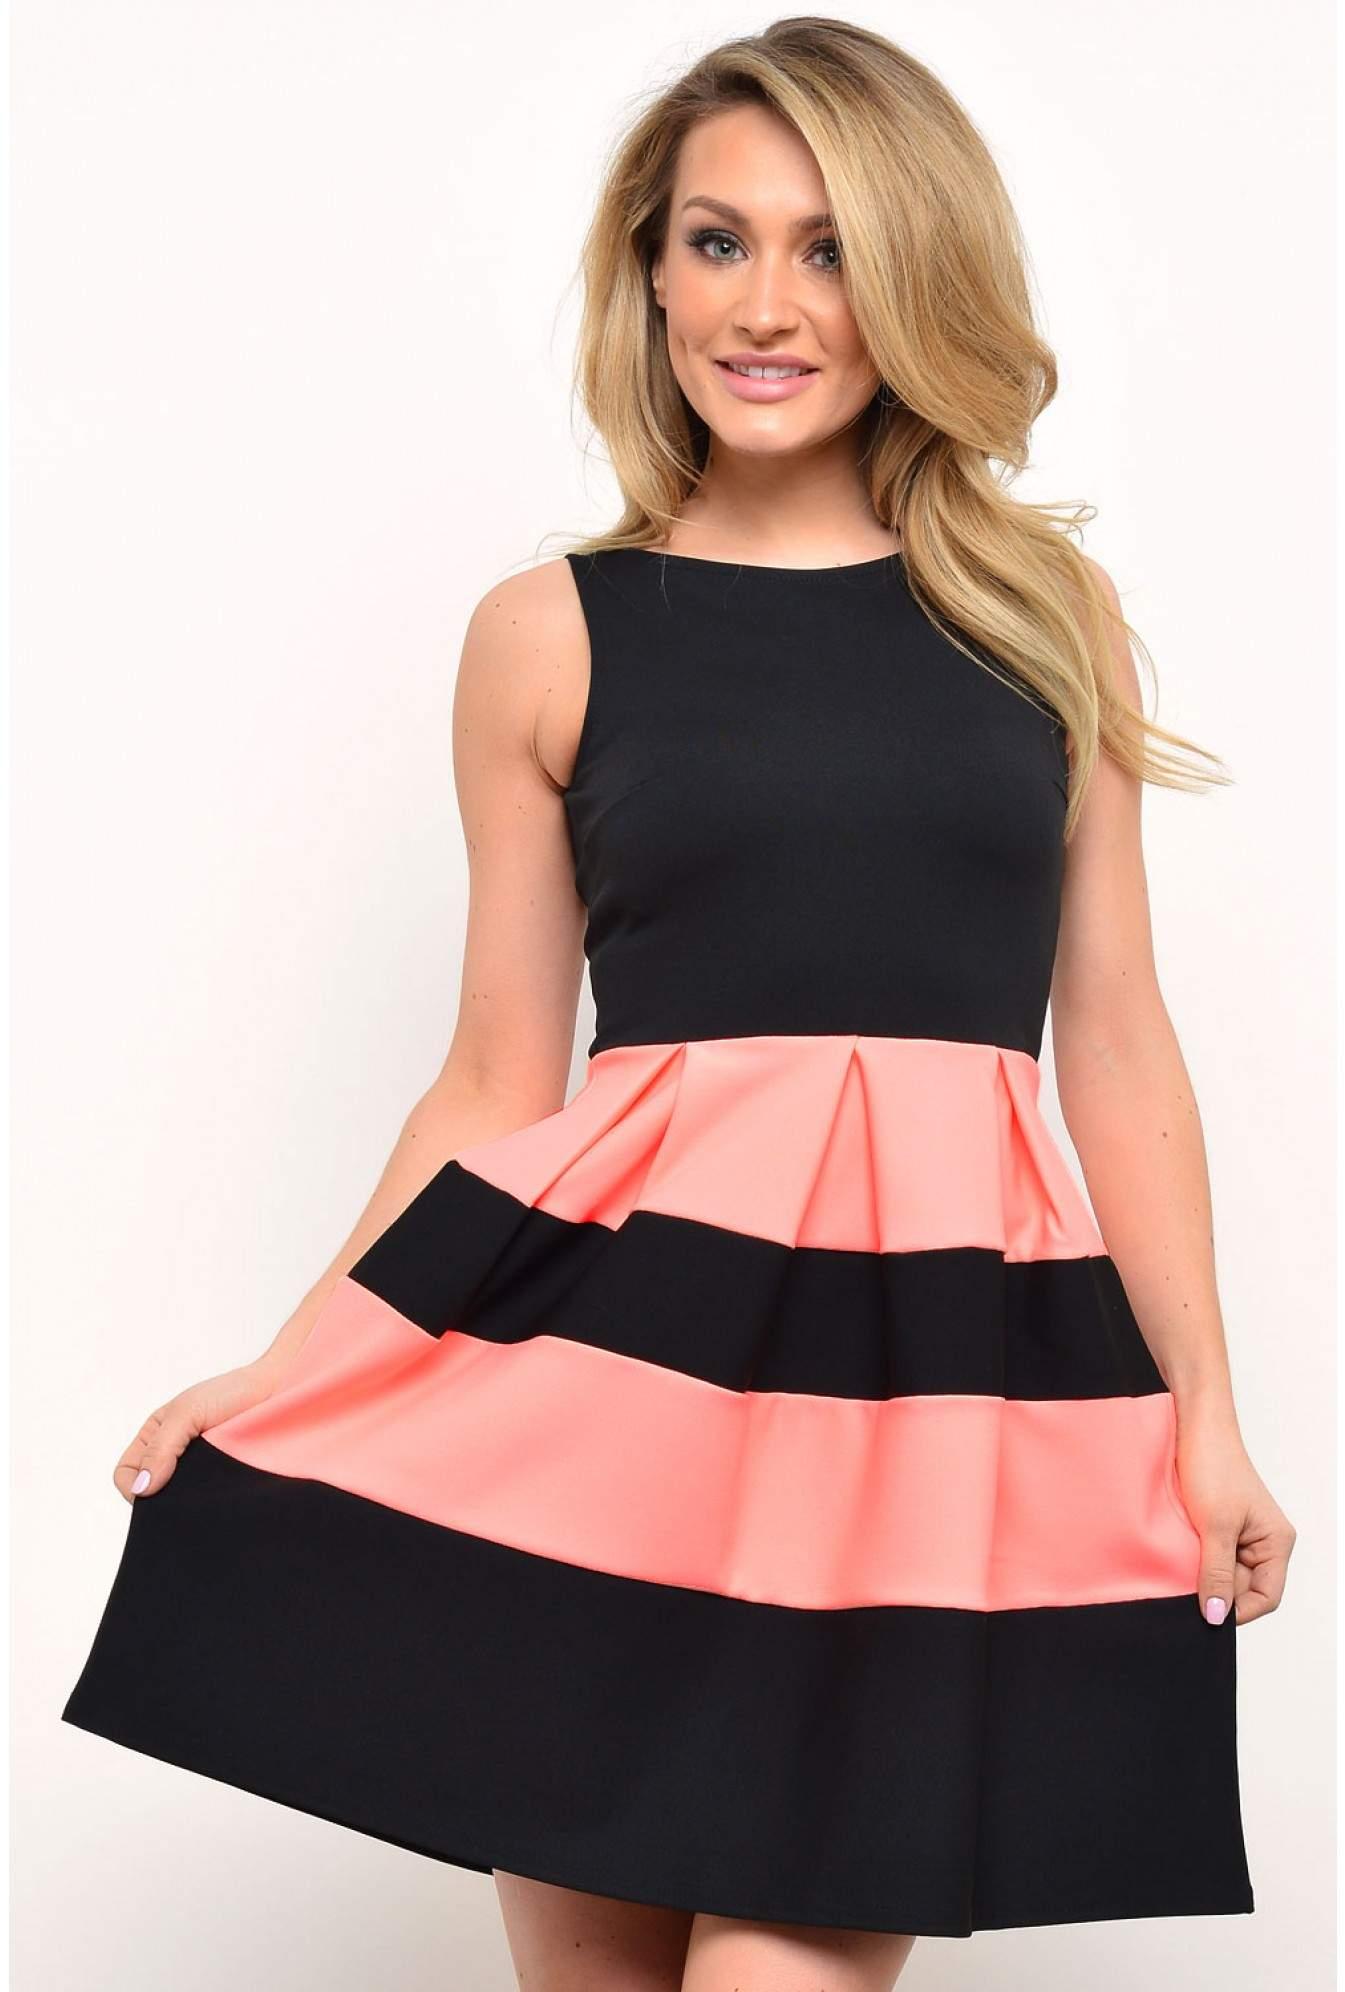 2369c1ac83 Evita Kellie Colour Block Skater Dress in Black and Coral